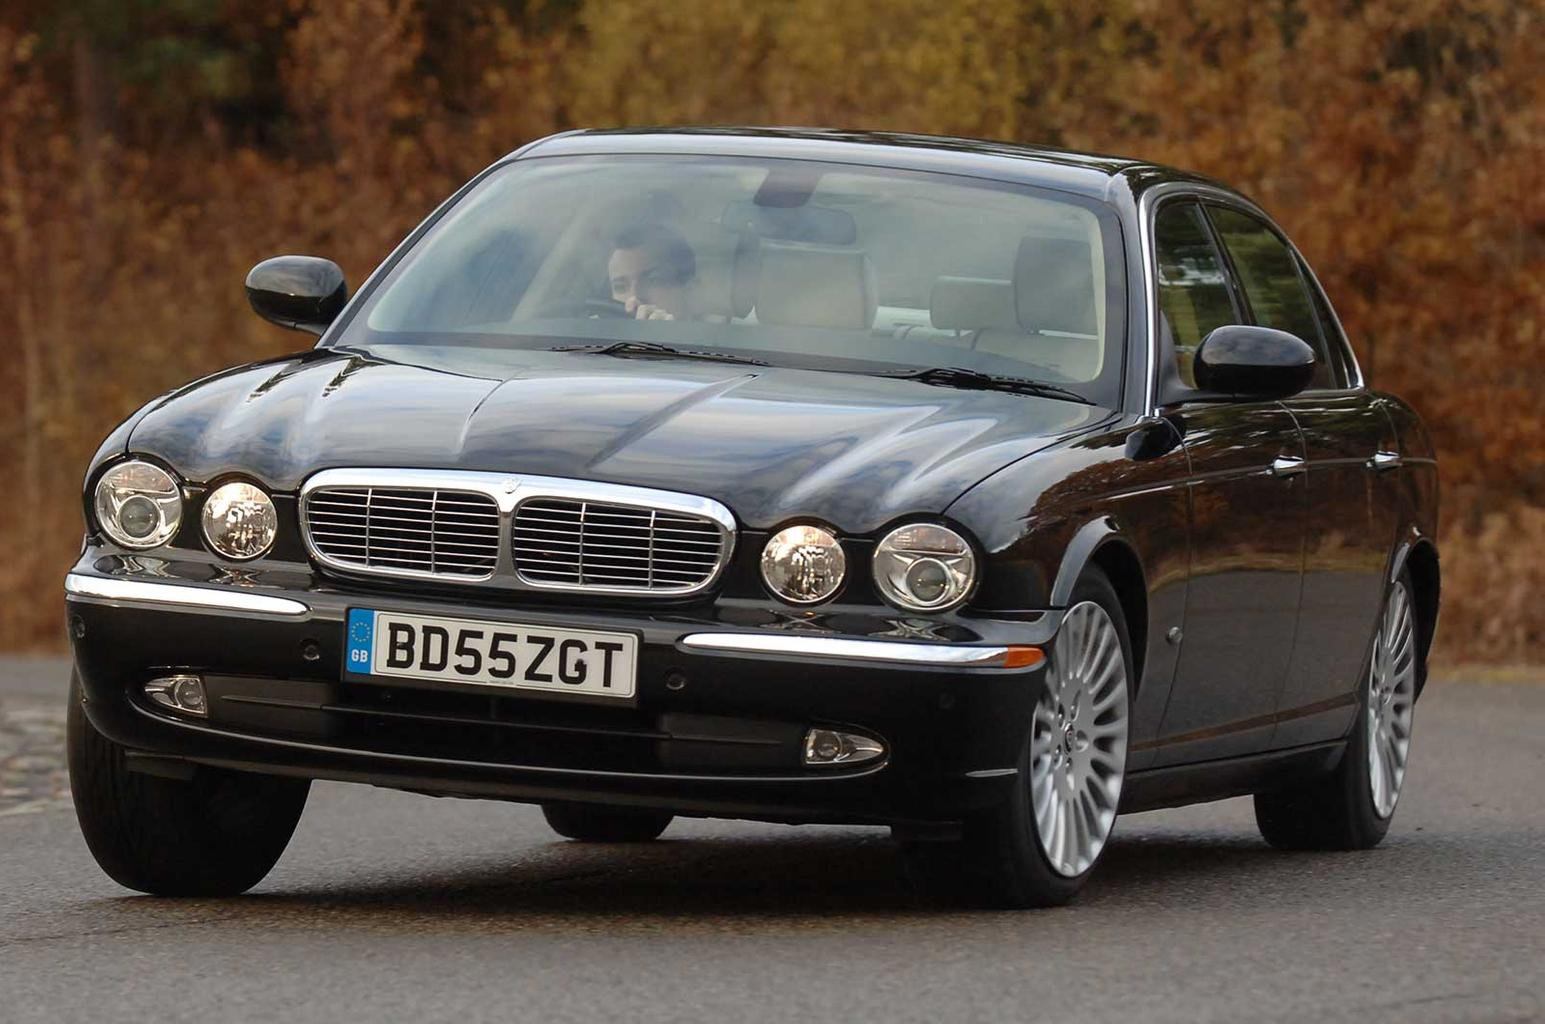 Used car of the week: Jaguar XJ